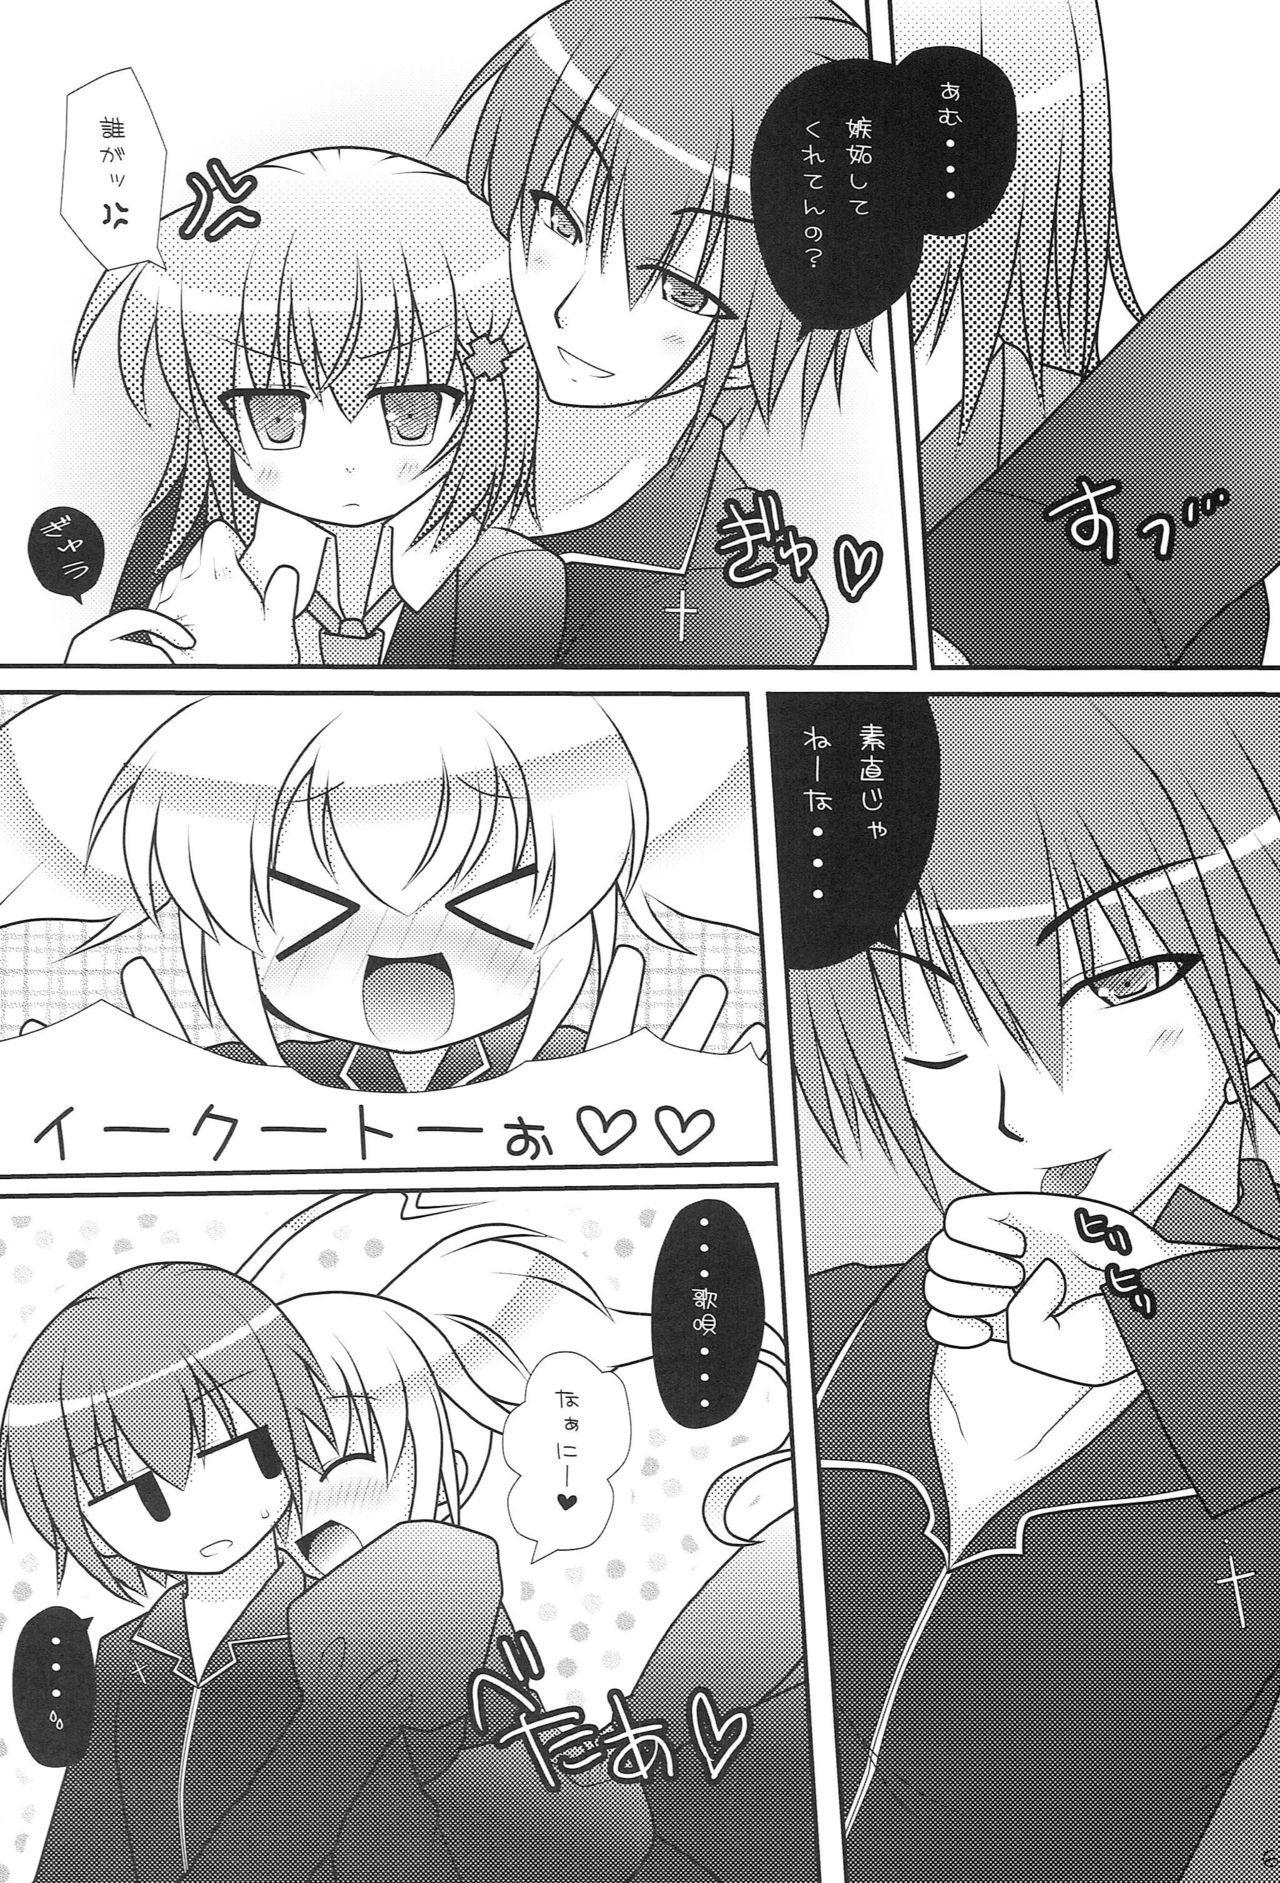 Konomi wa Docchi? 4